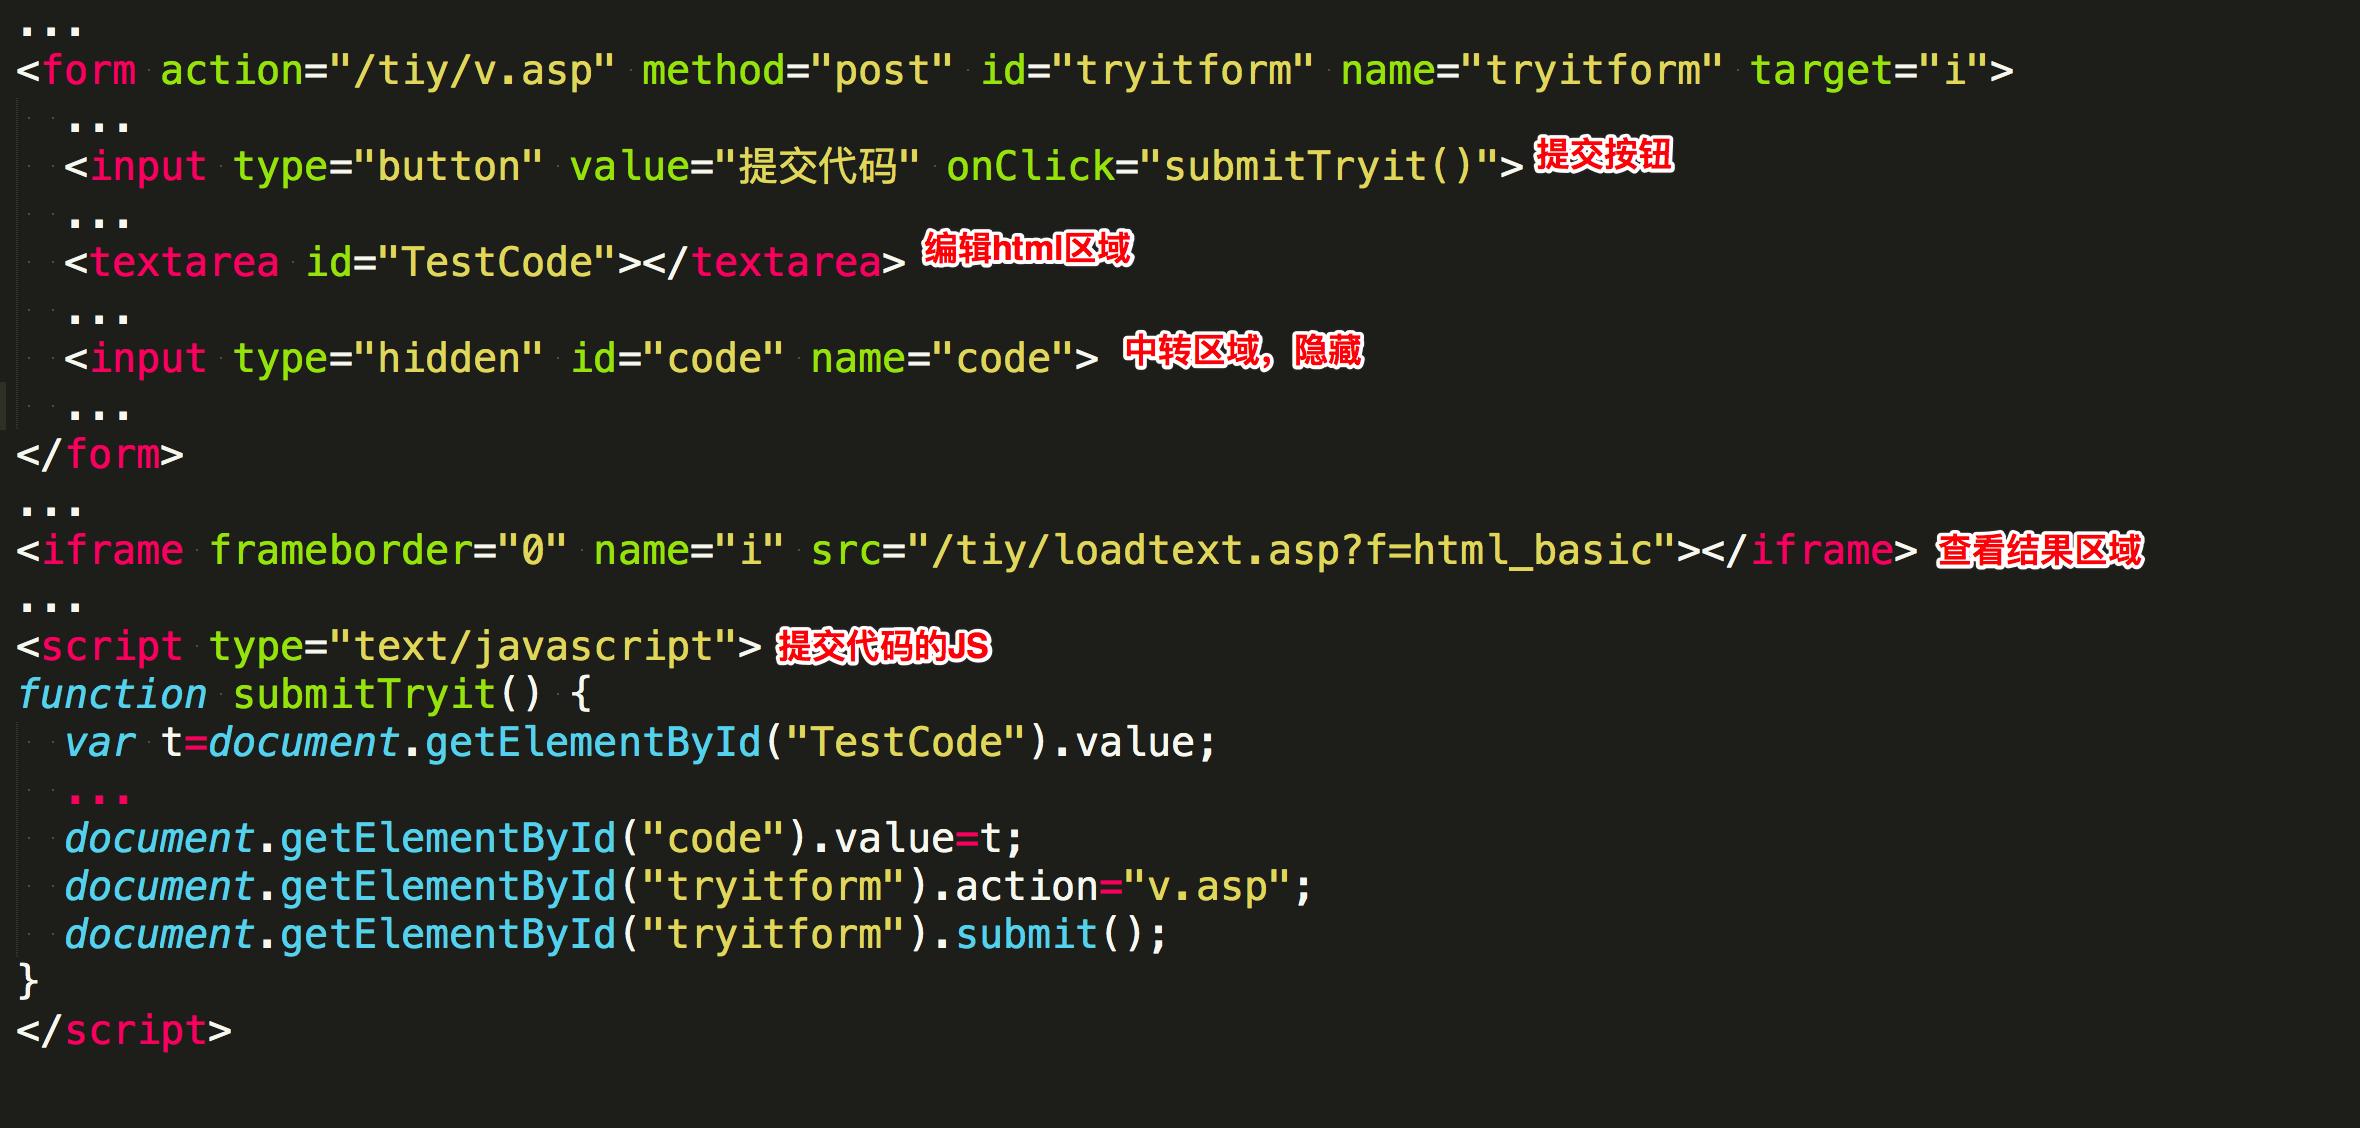 HTML的iframe标签妙用- 在线执行前端代码的网站原理是什么?